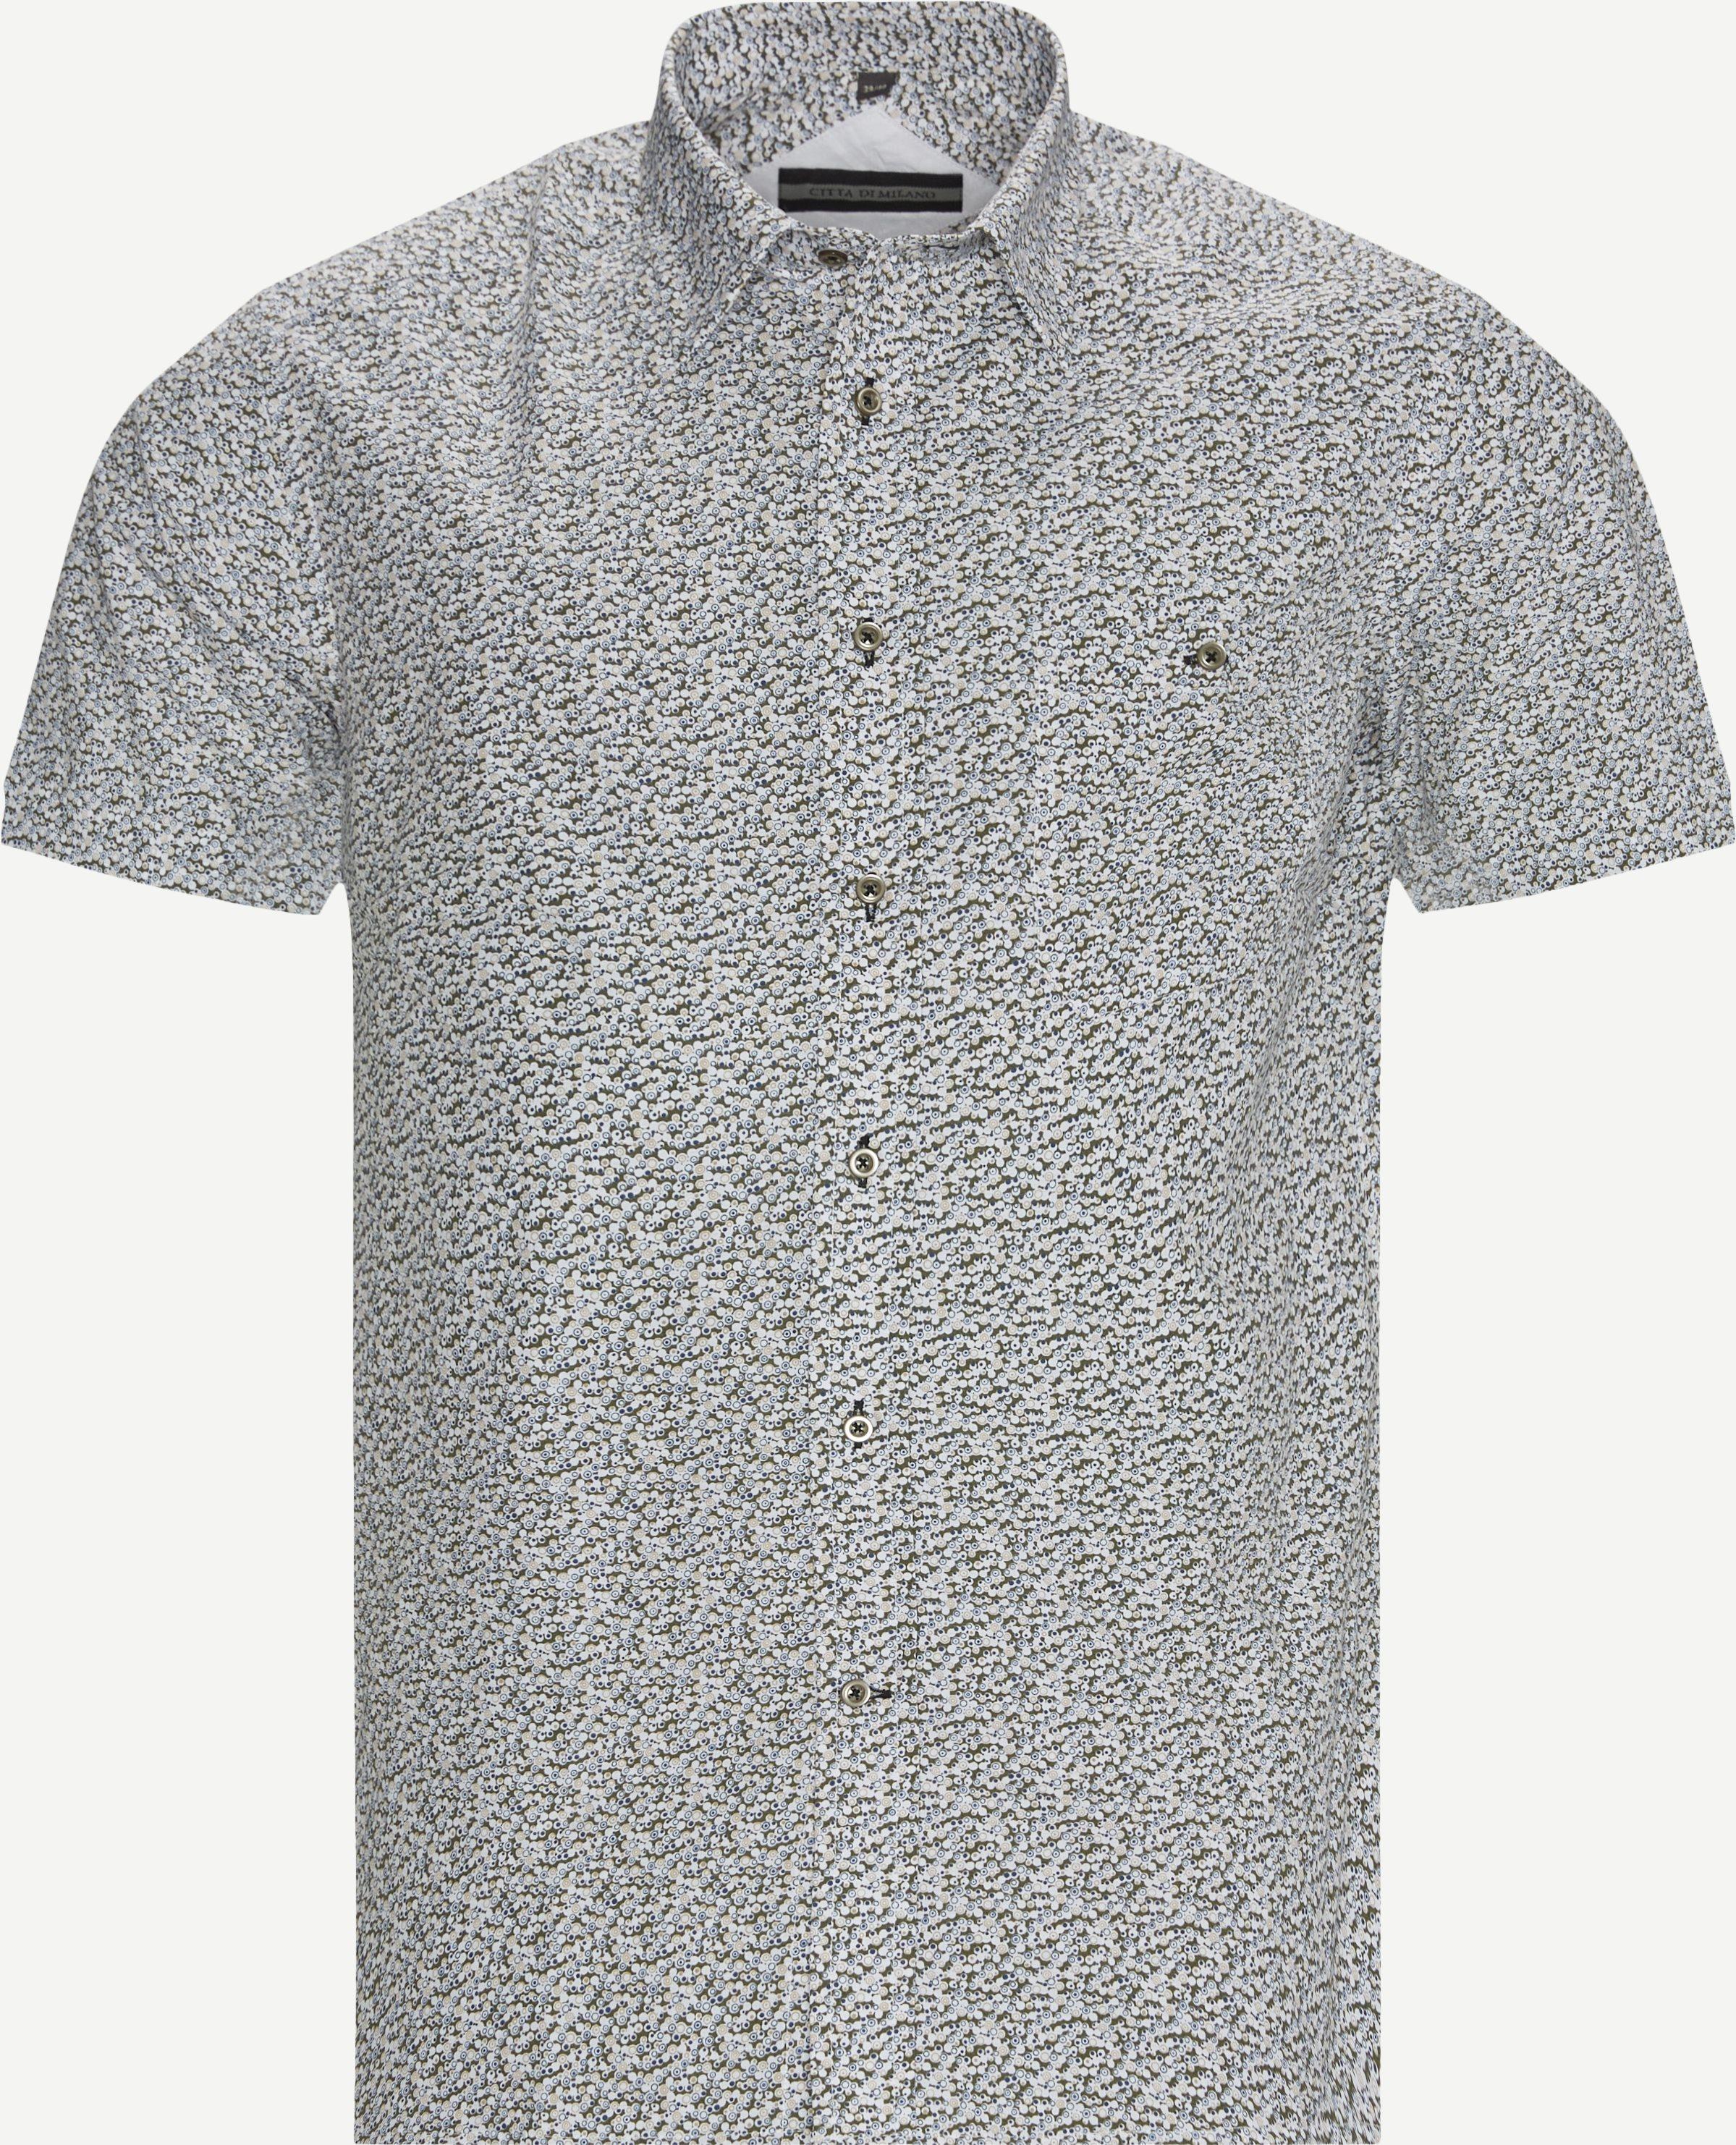 Lugano K/Æ Skjorte - Kortärmade skjortor - Regular fit - Blå